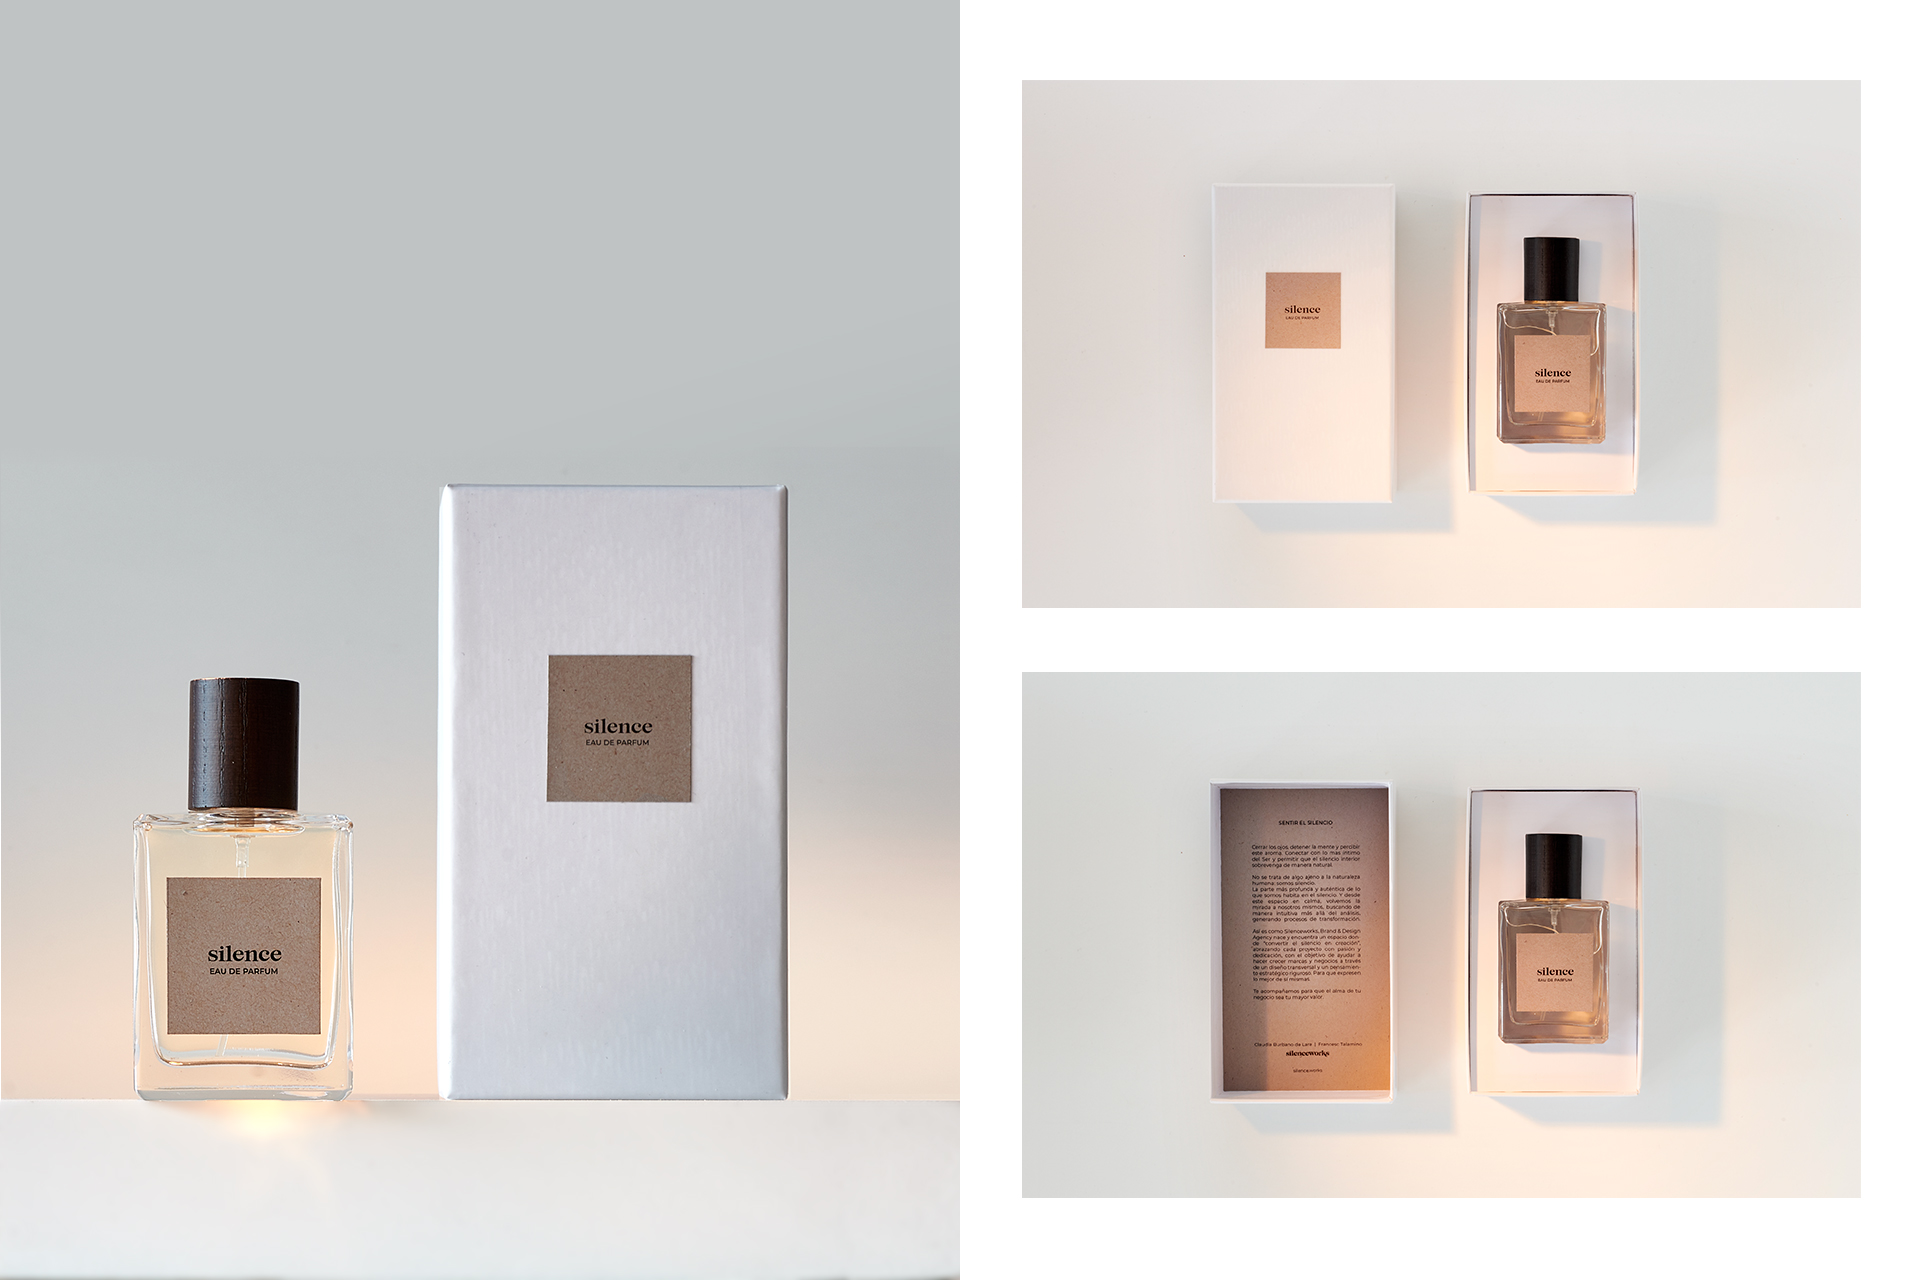 Silenceworks 'Eau de Parfum' by Silenceworks - Creative Work